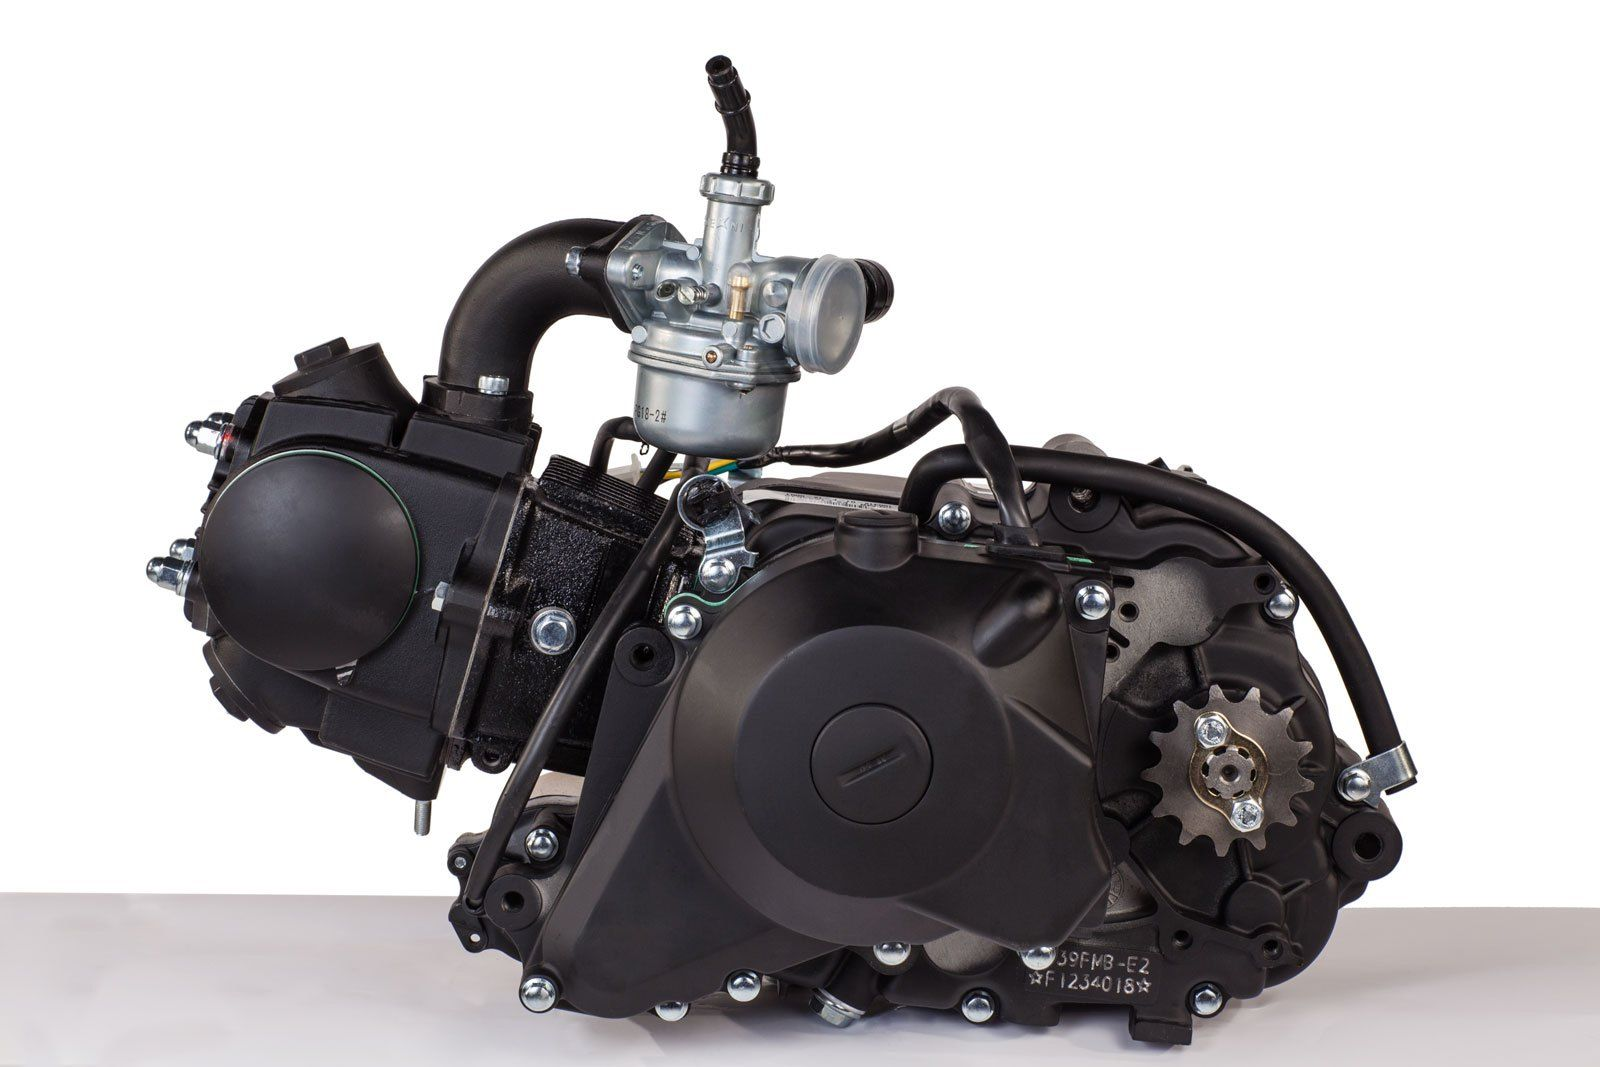 49cc Engine 2 Stage Automatic / Electric Start | Pinterest | Engine ...